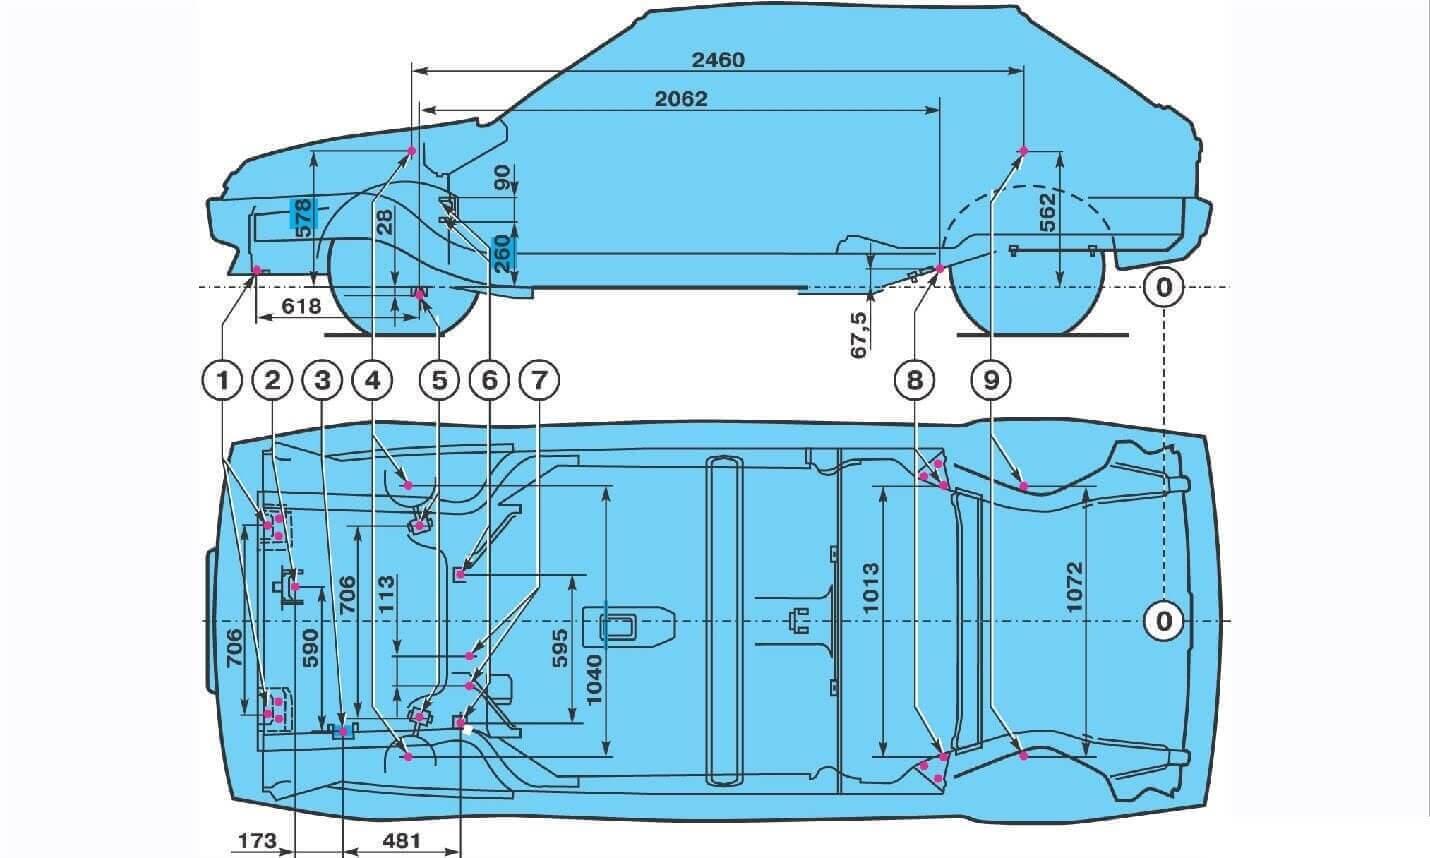 Хабаровске гидроизоляция в